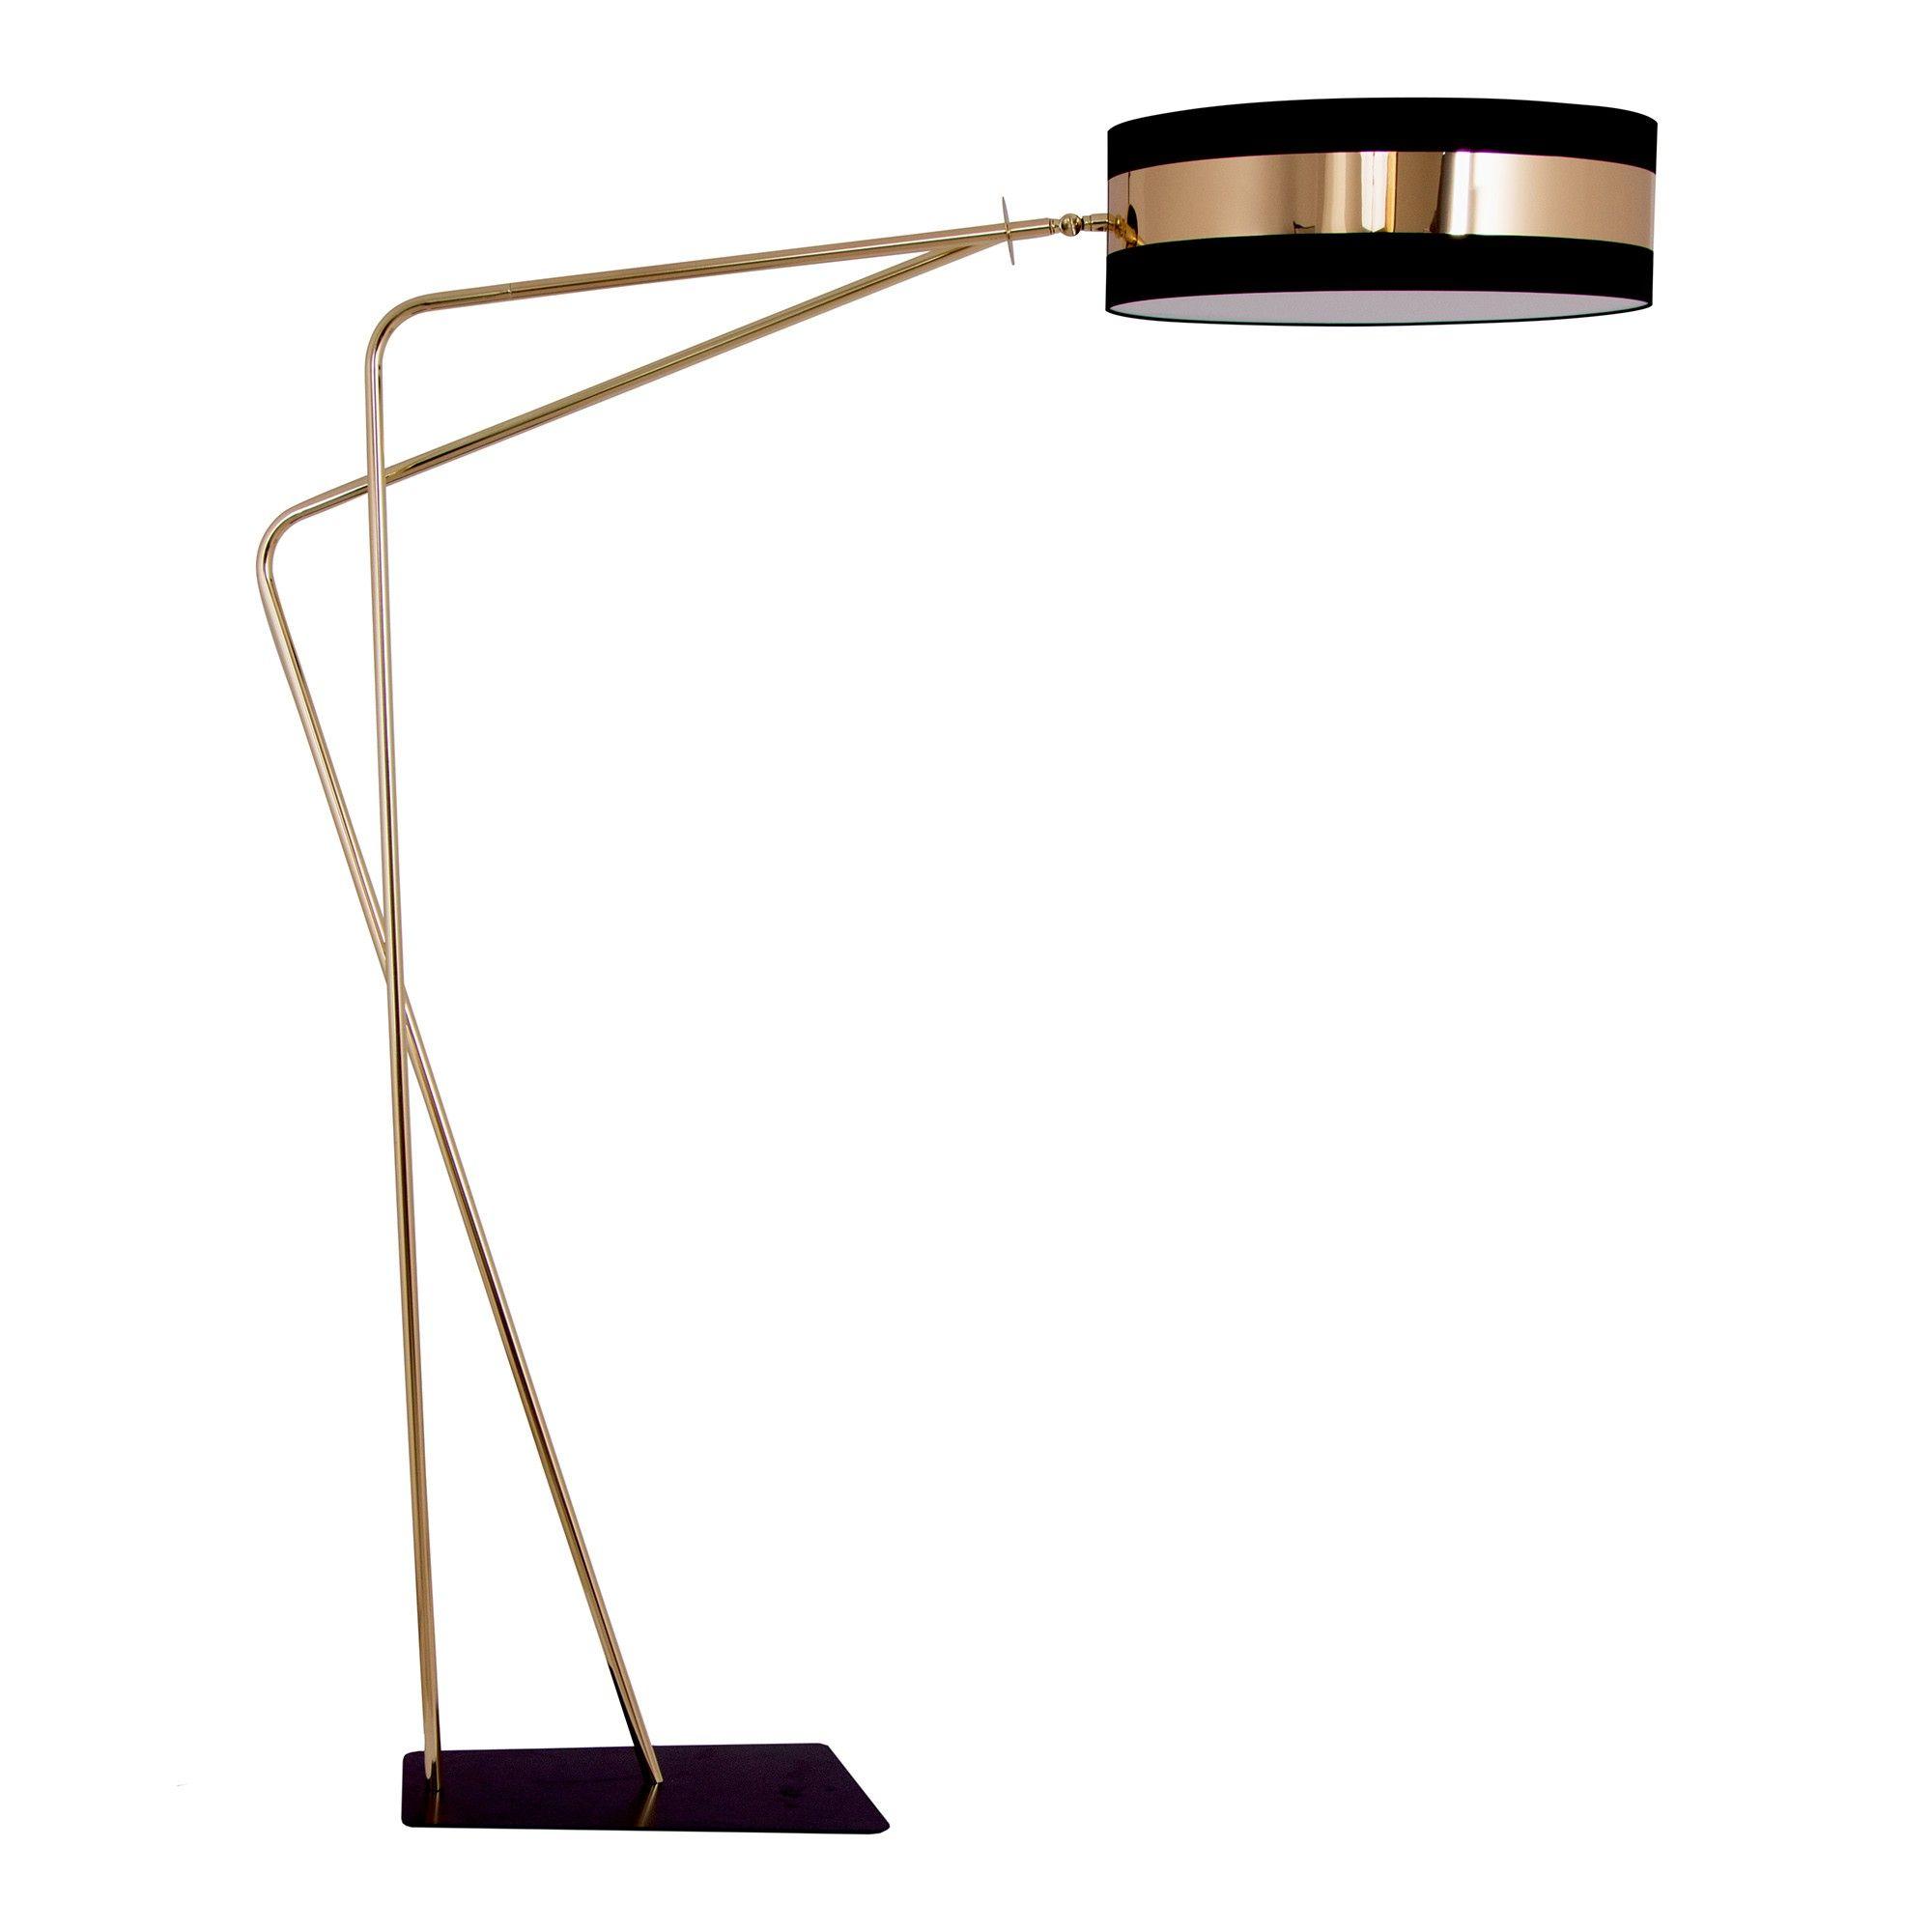 Pin By 中山市横栏镇琪威灯饰 On Floor Lamps Lamp Floor Standing Lamps Standing Lamp